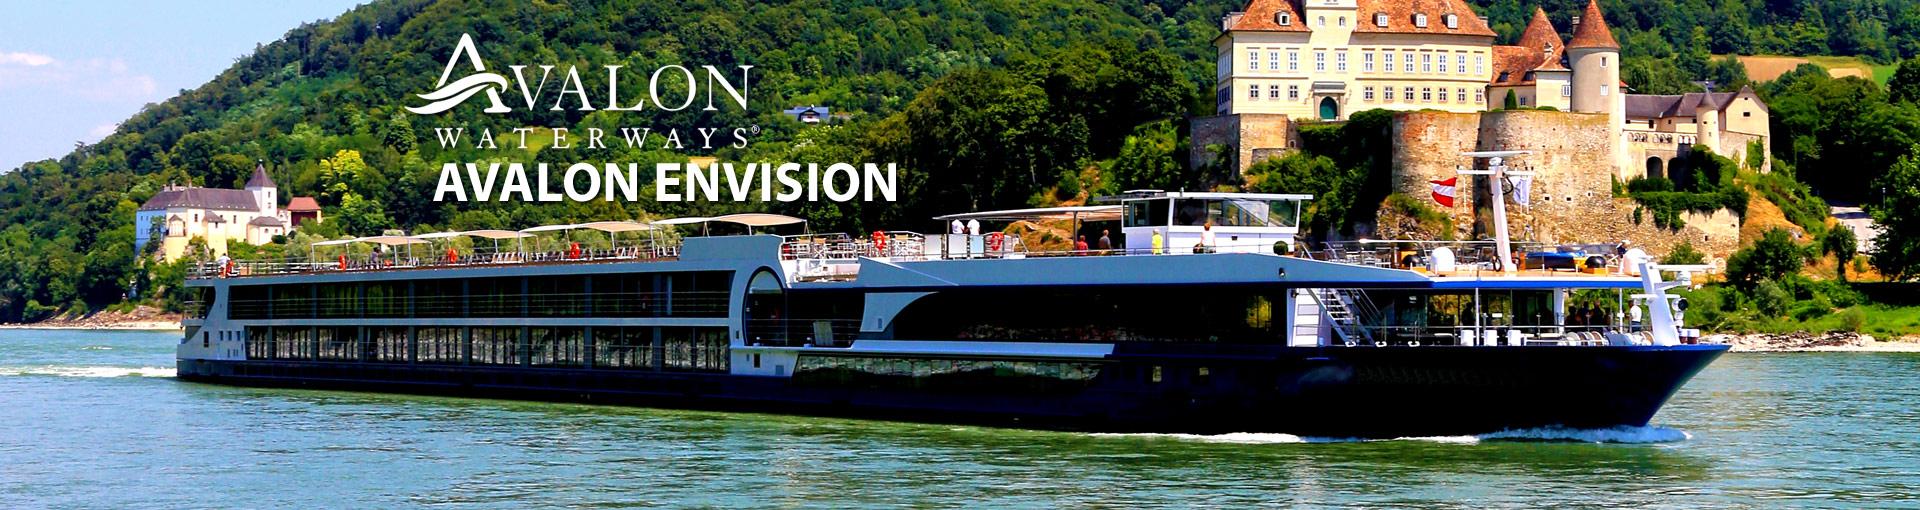 Avalon Envision Cruise Ship Banner